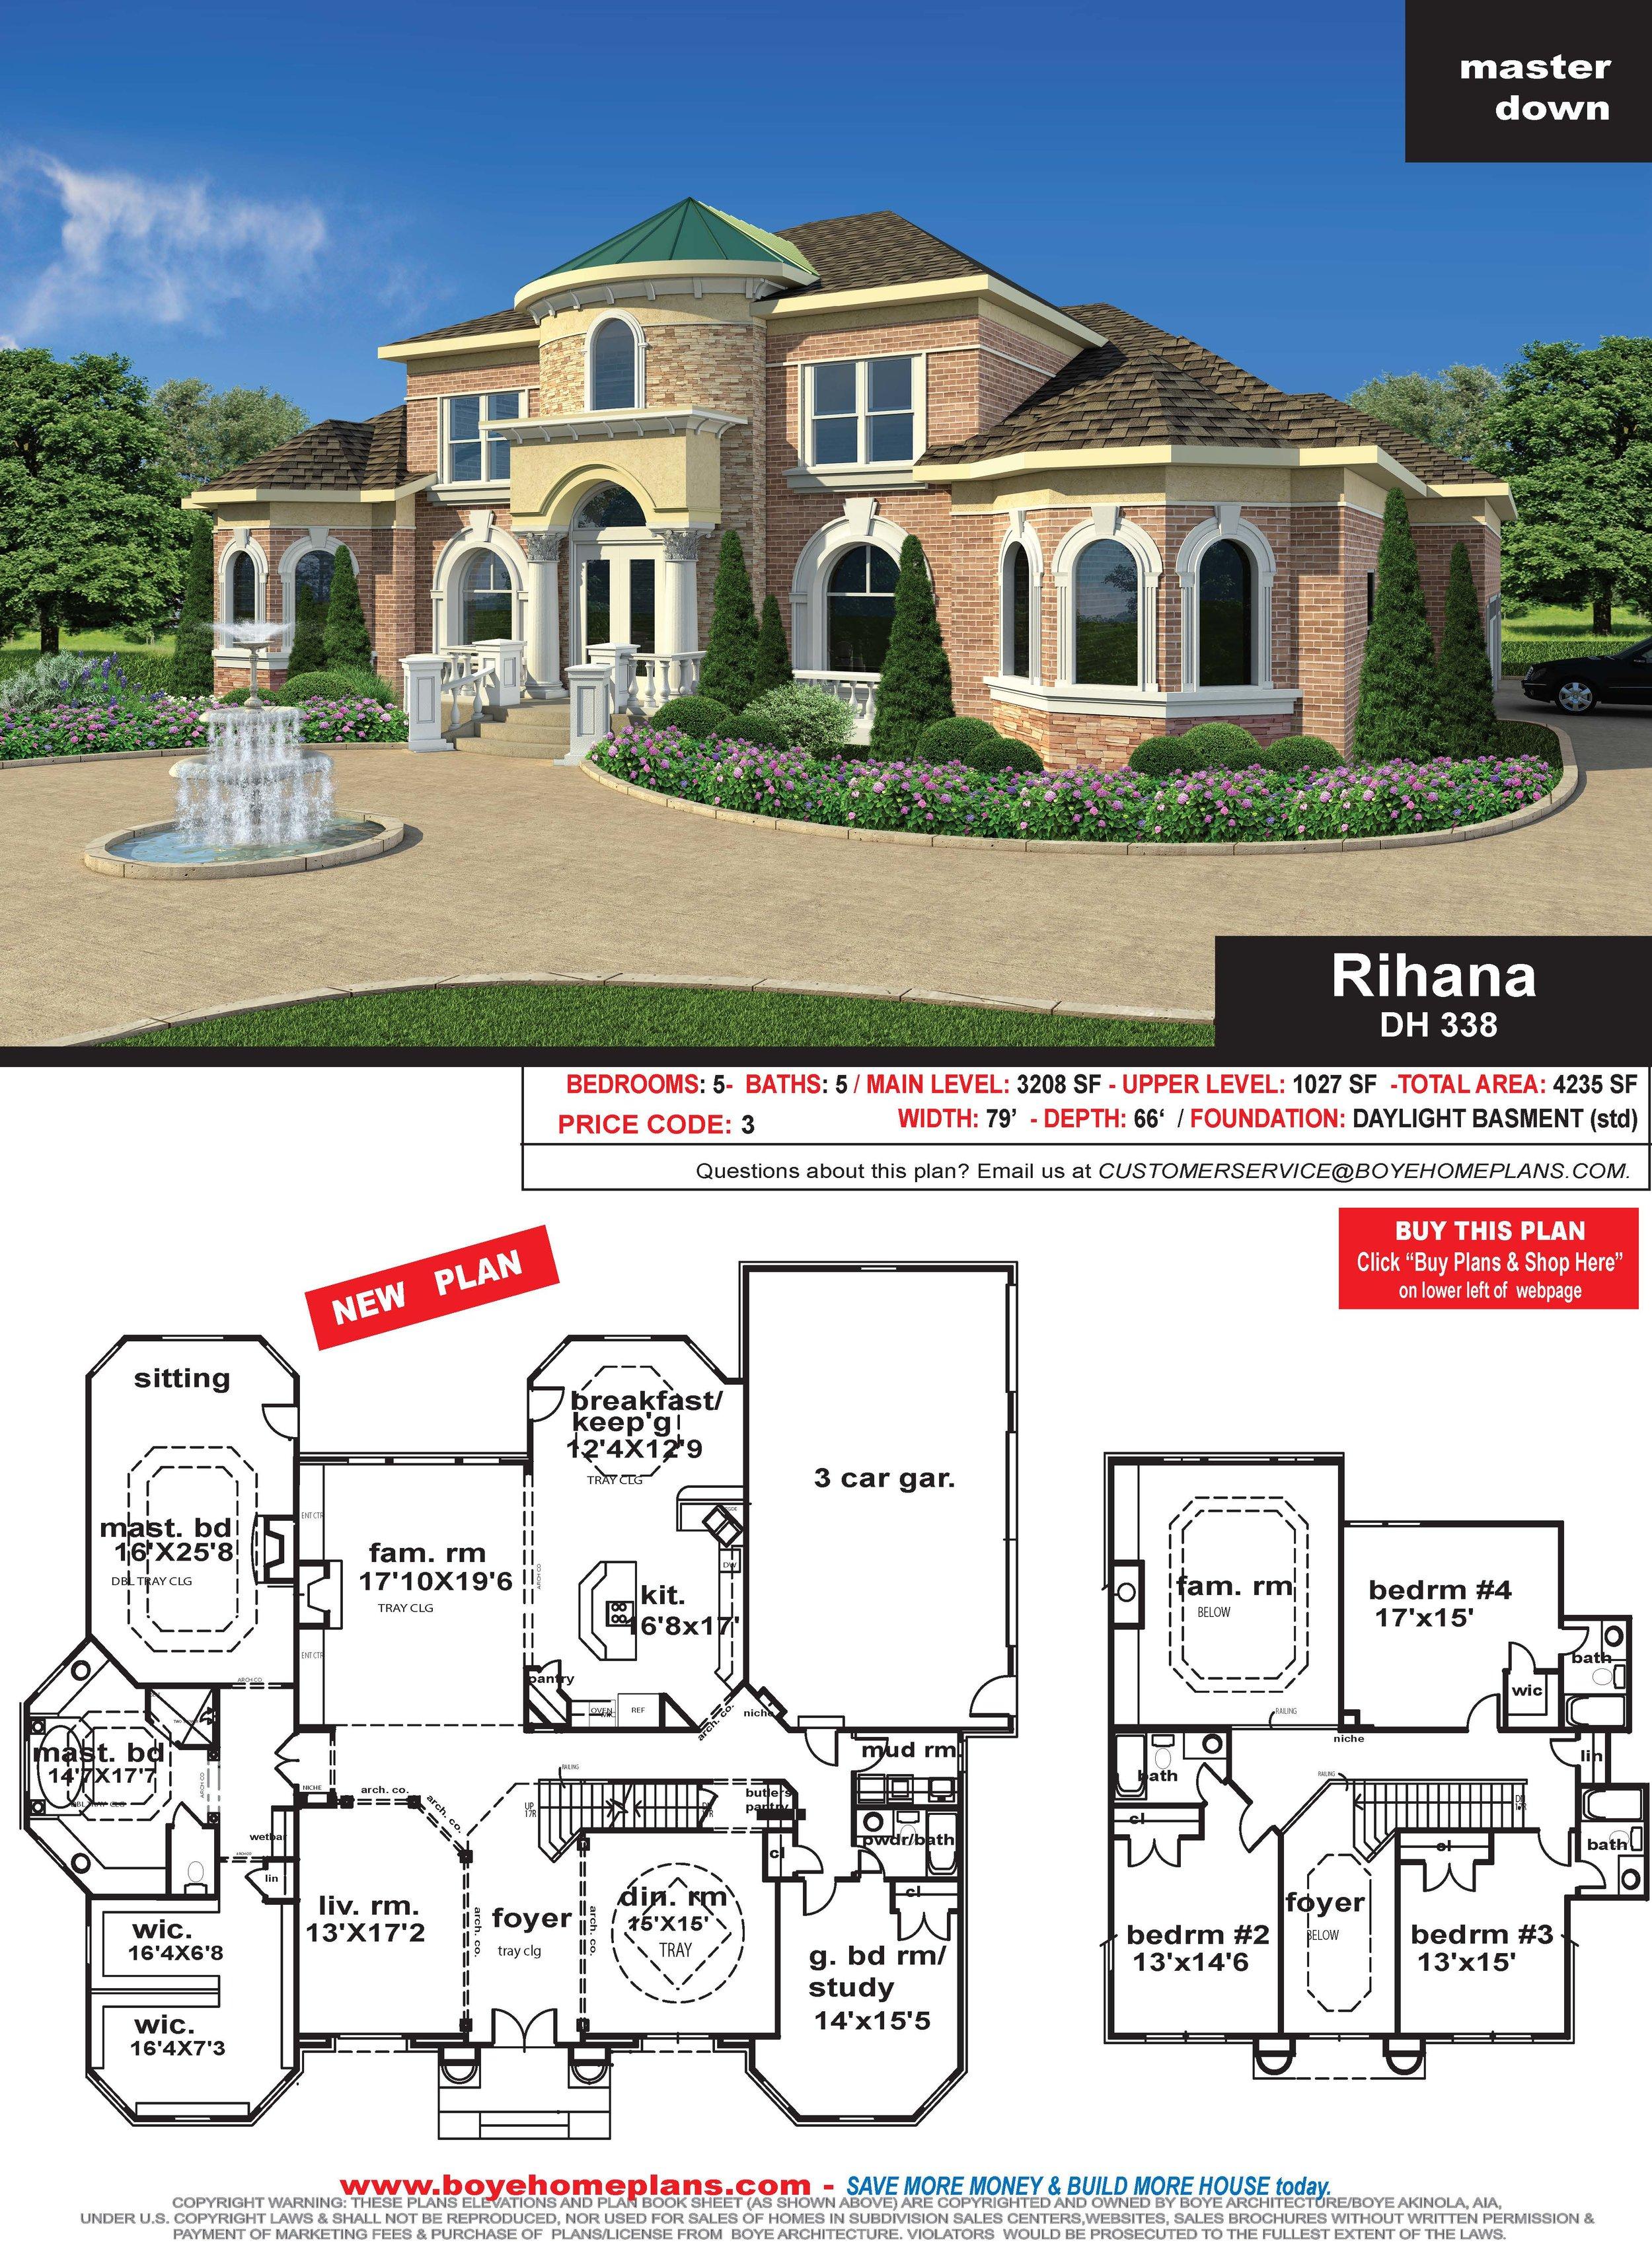 RIHANA PLAN PAGE-DH338-070416-rev.jpg